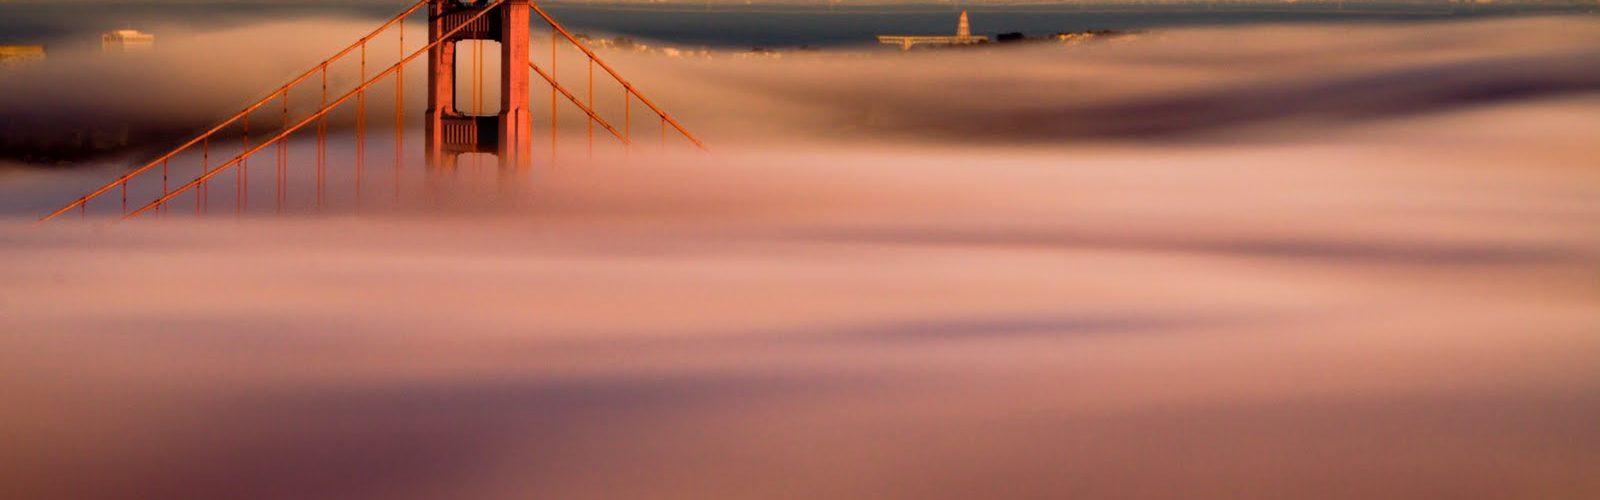 brouillard-san-francisco-une